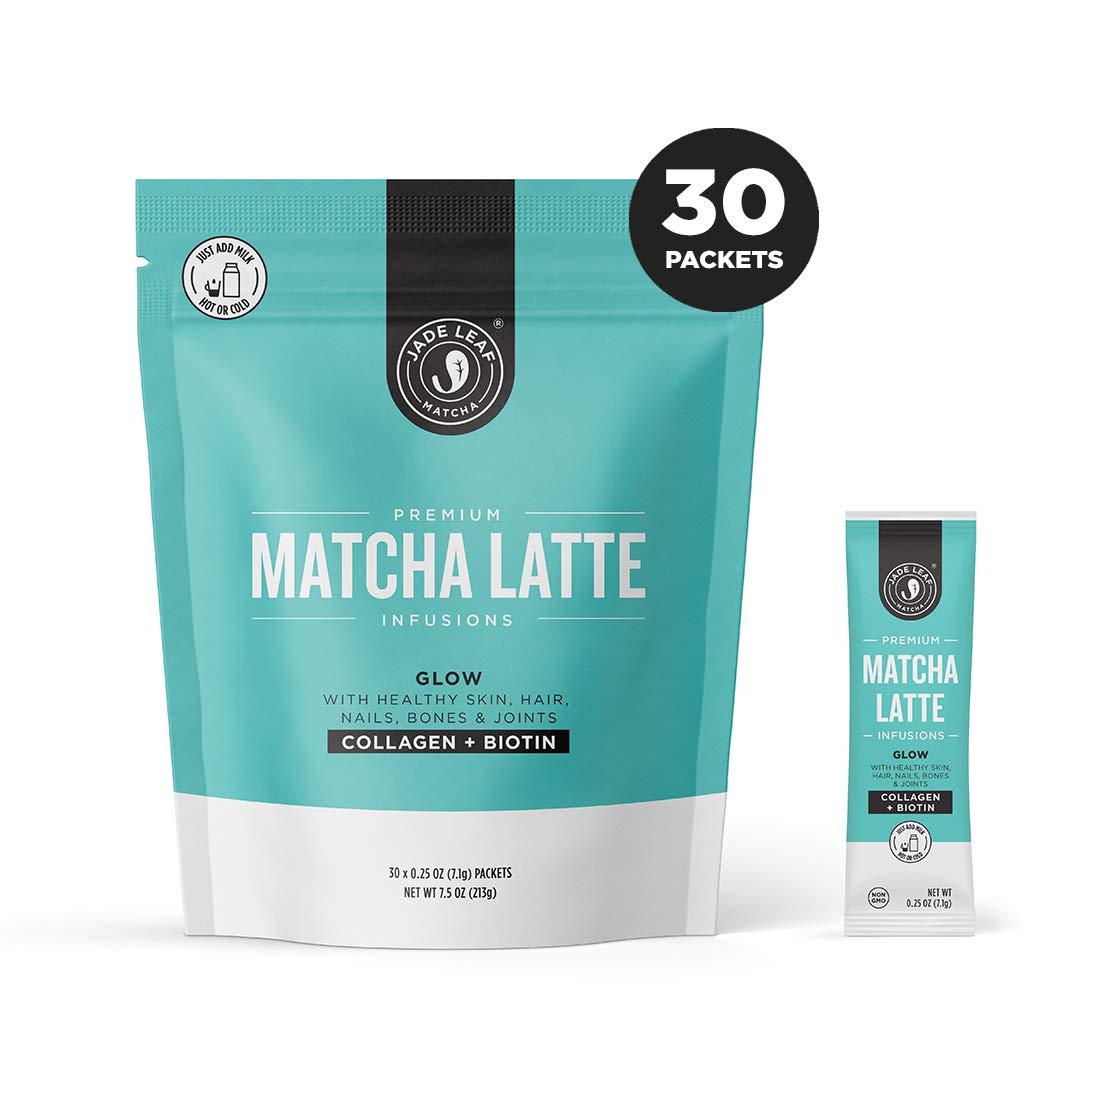 Jade Leaf Matcha Latte Infusions - GLOW - Collagen + Biotin - 30ct Single Serves